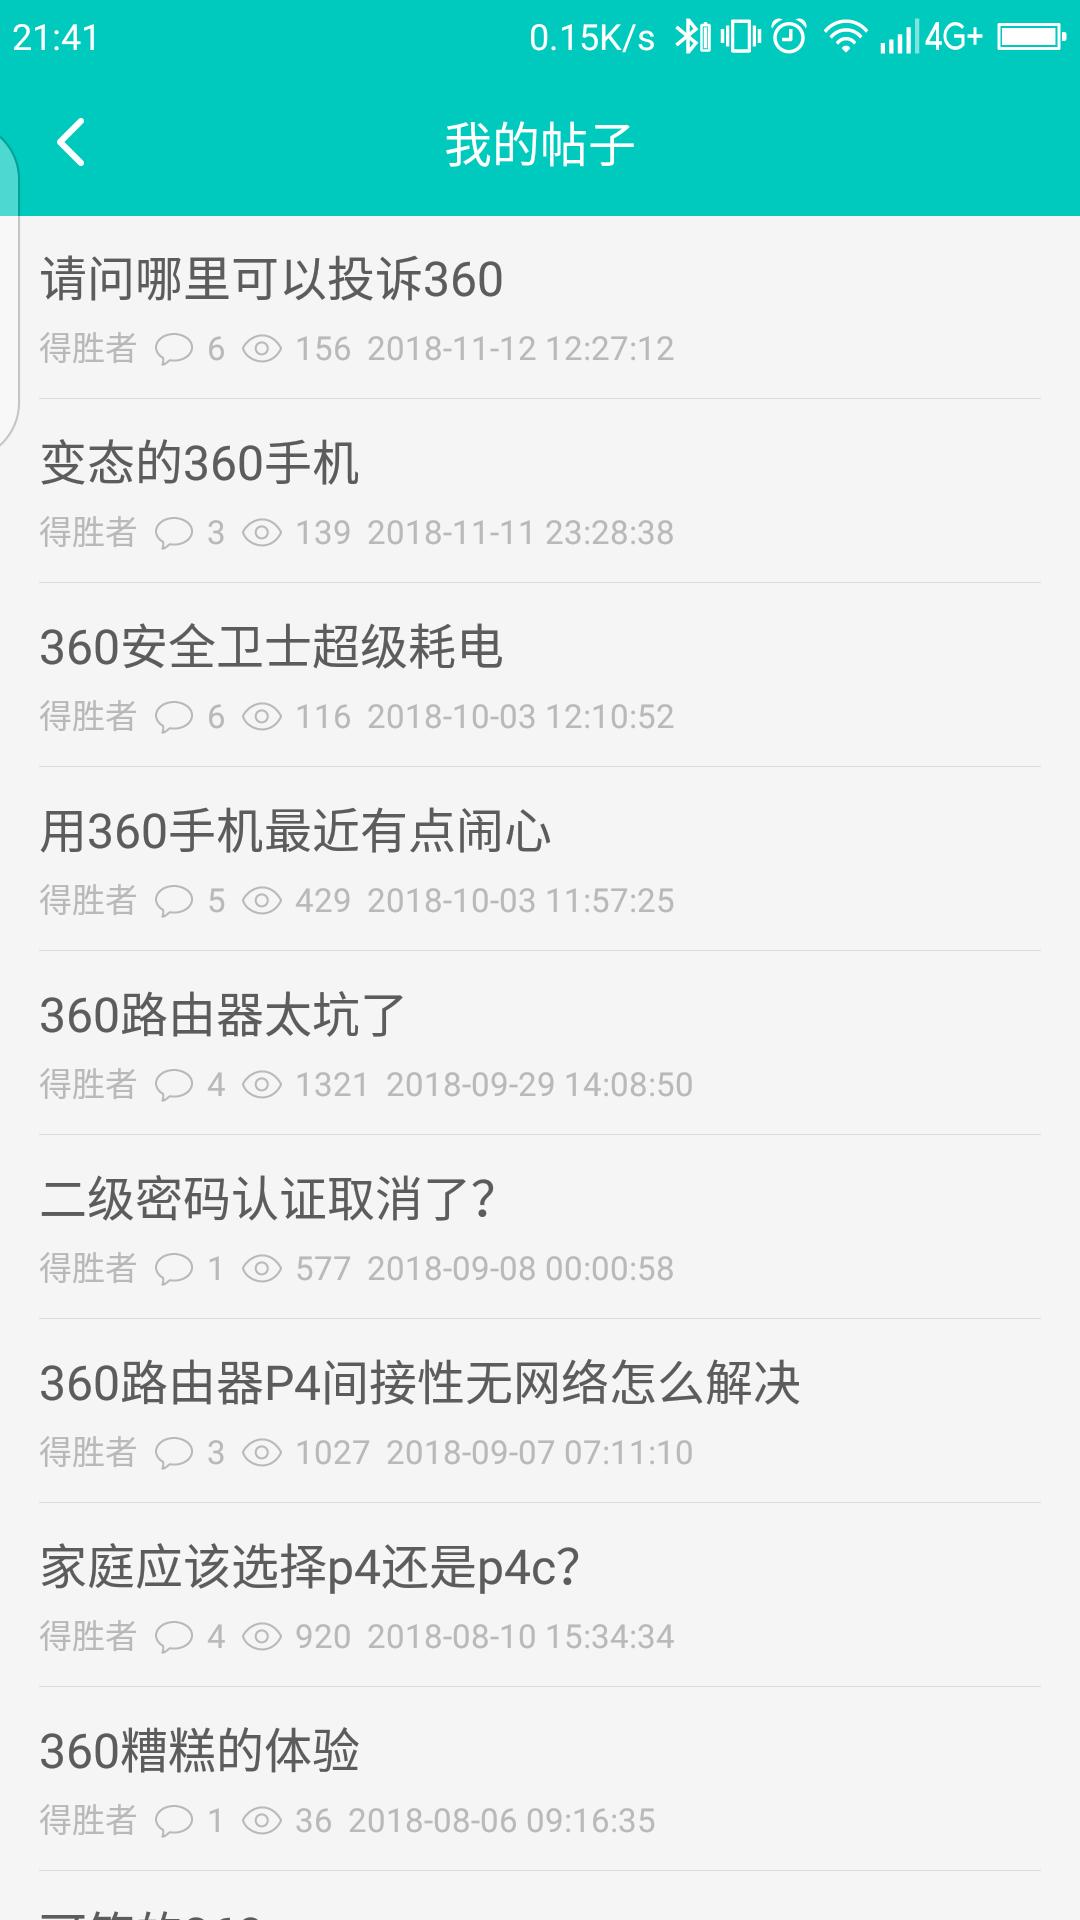 Screenshot_2018-11-12-21-41-15.png